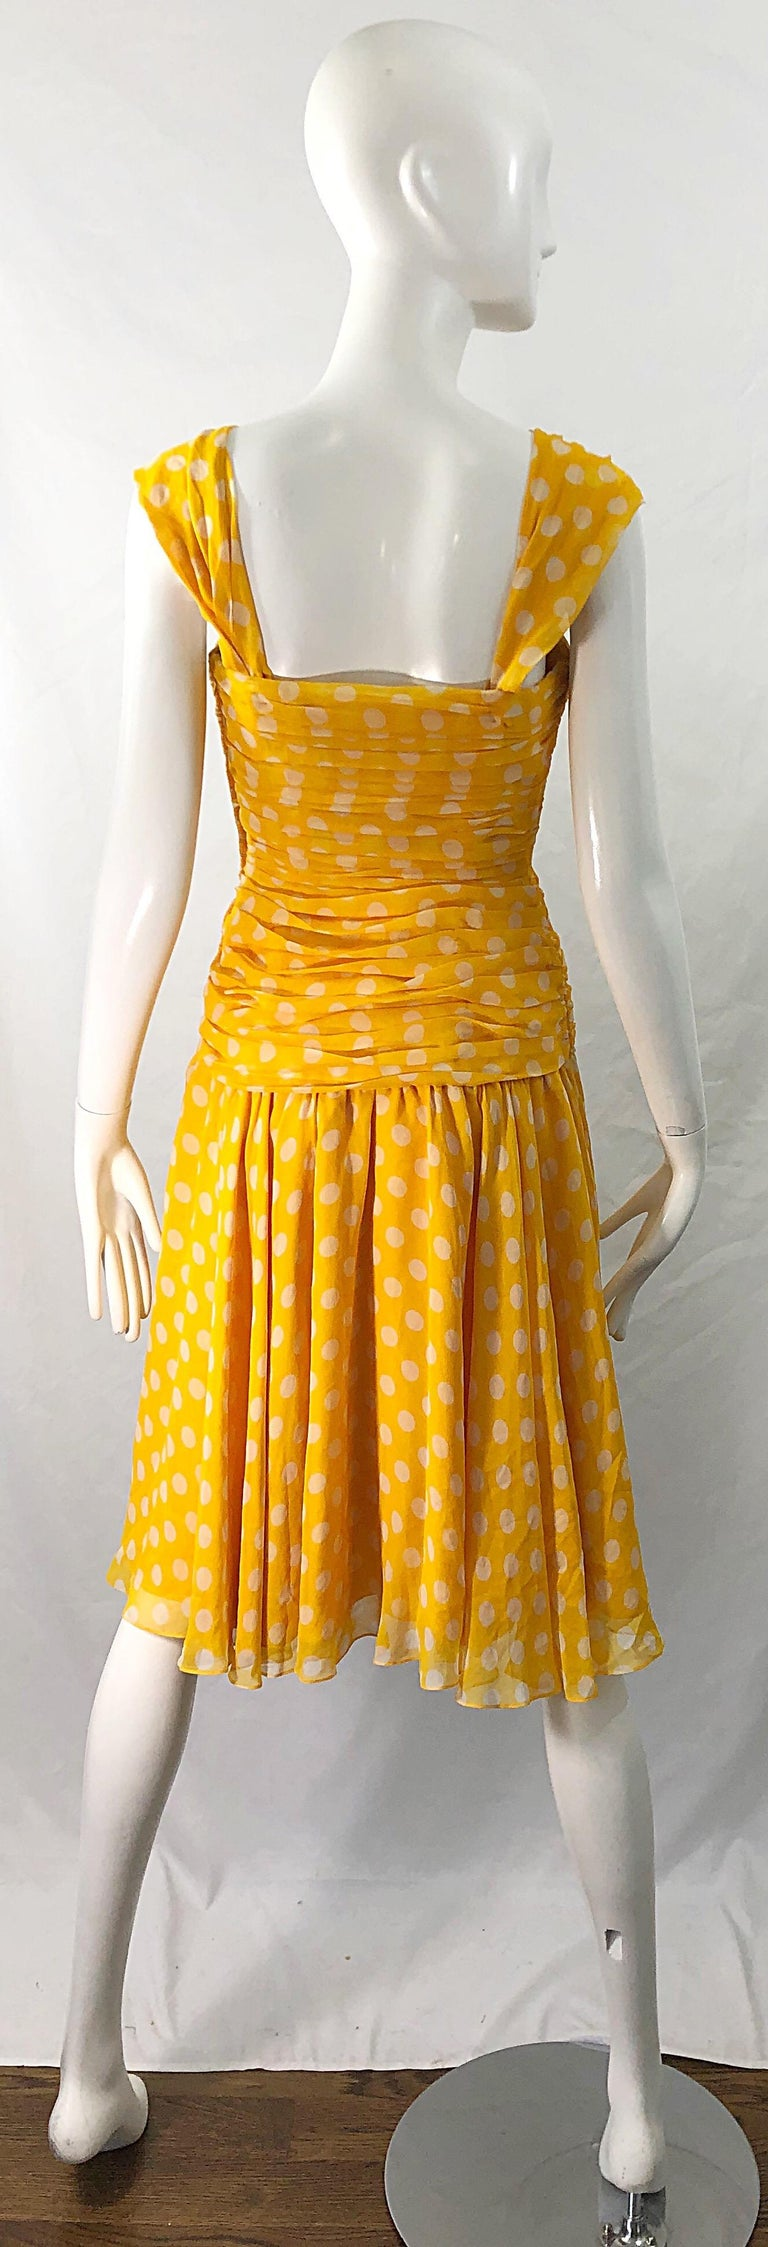 Adele Simpson 1980s Size 4 Yellow White Silk Chiffon Polka Dot Vintage 80s Dress For Sale 8